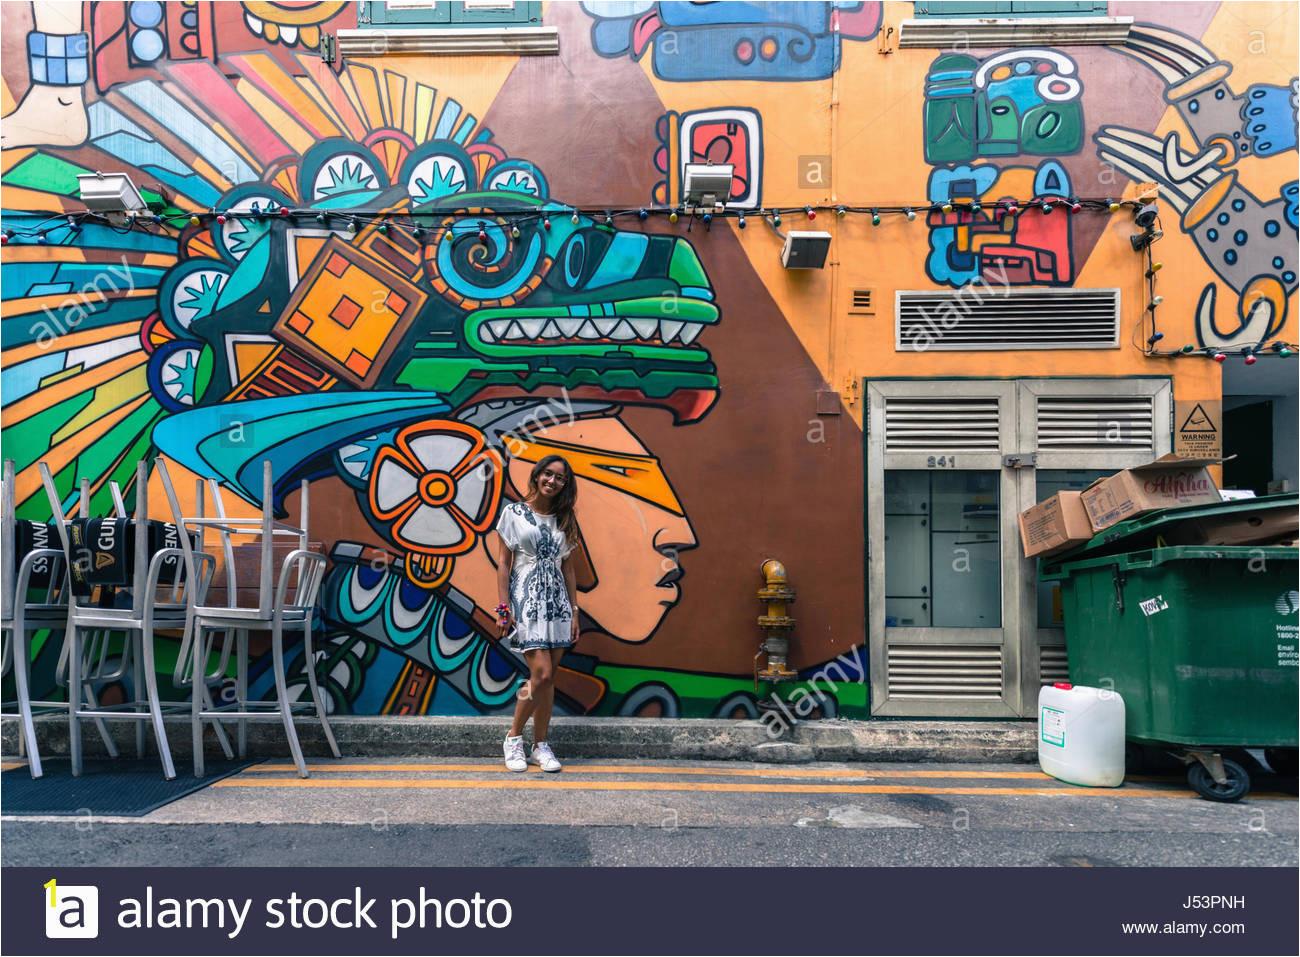 colorful exterior wall mural outside bar haji lane arab quarter singapore J53PNH